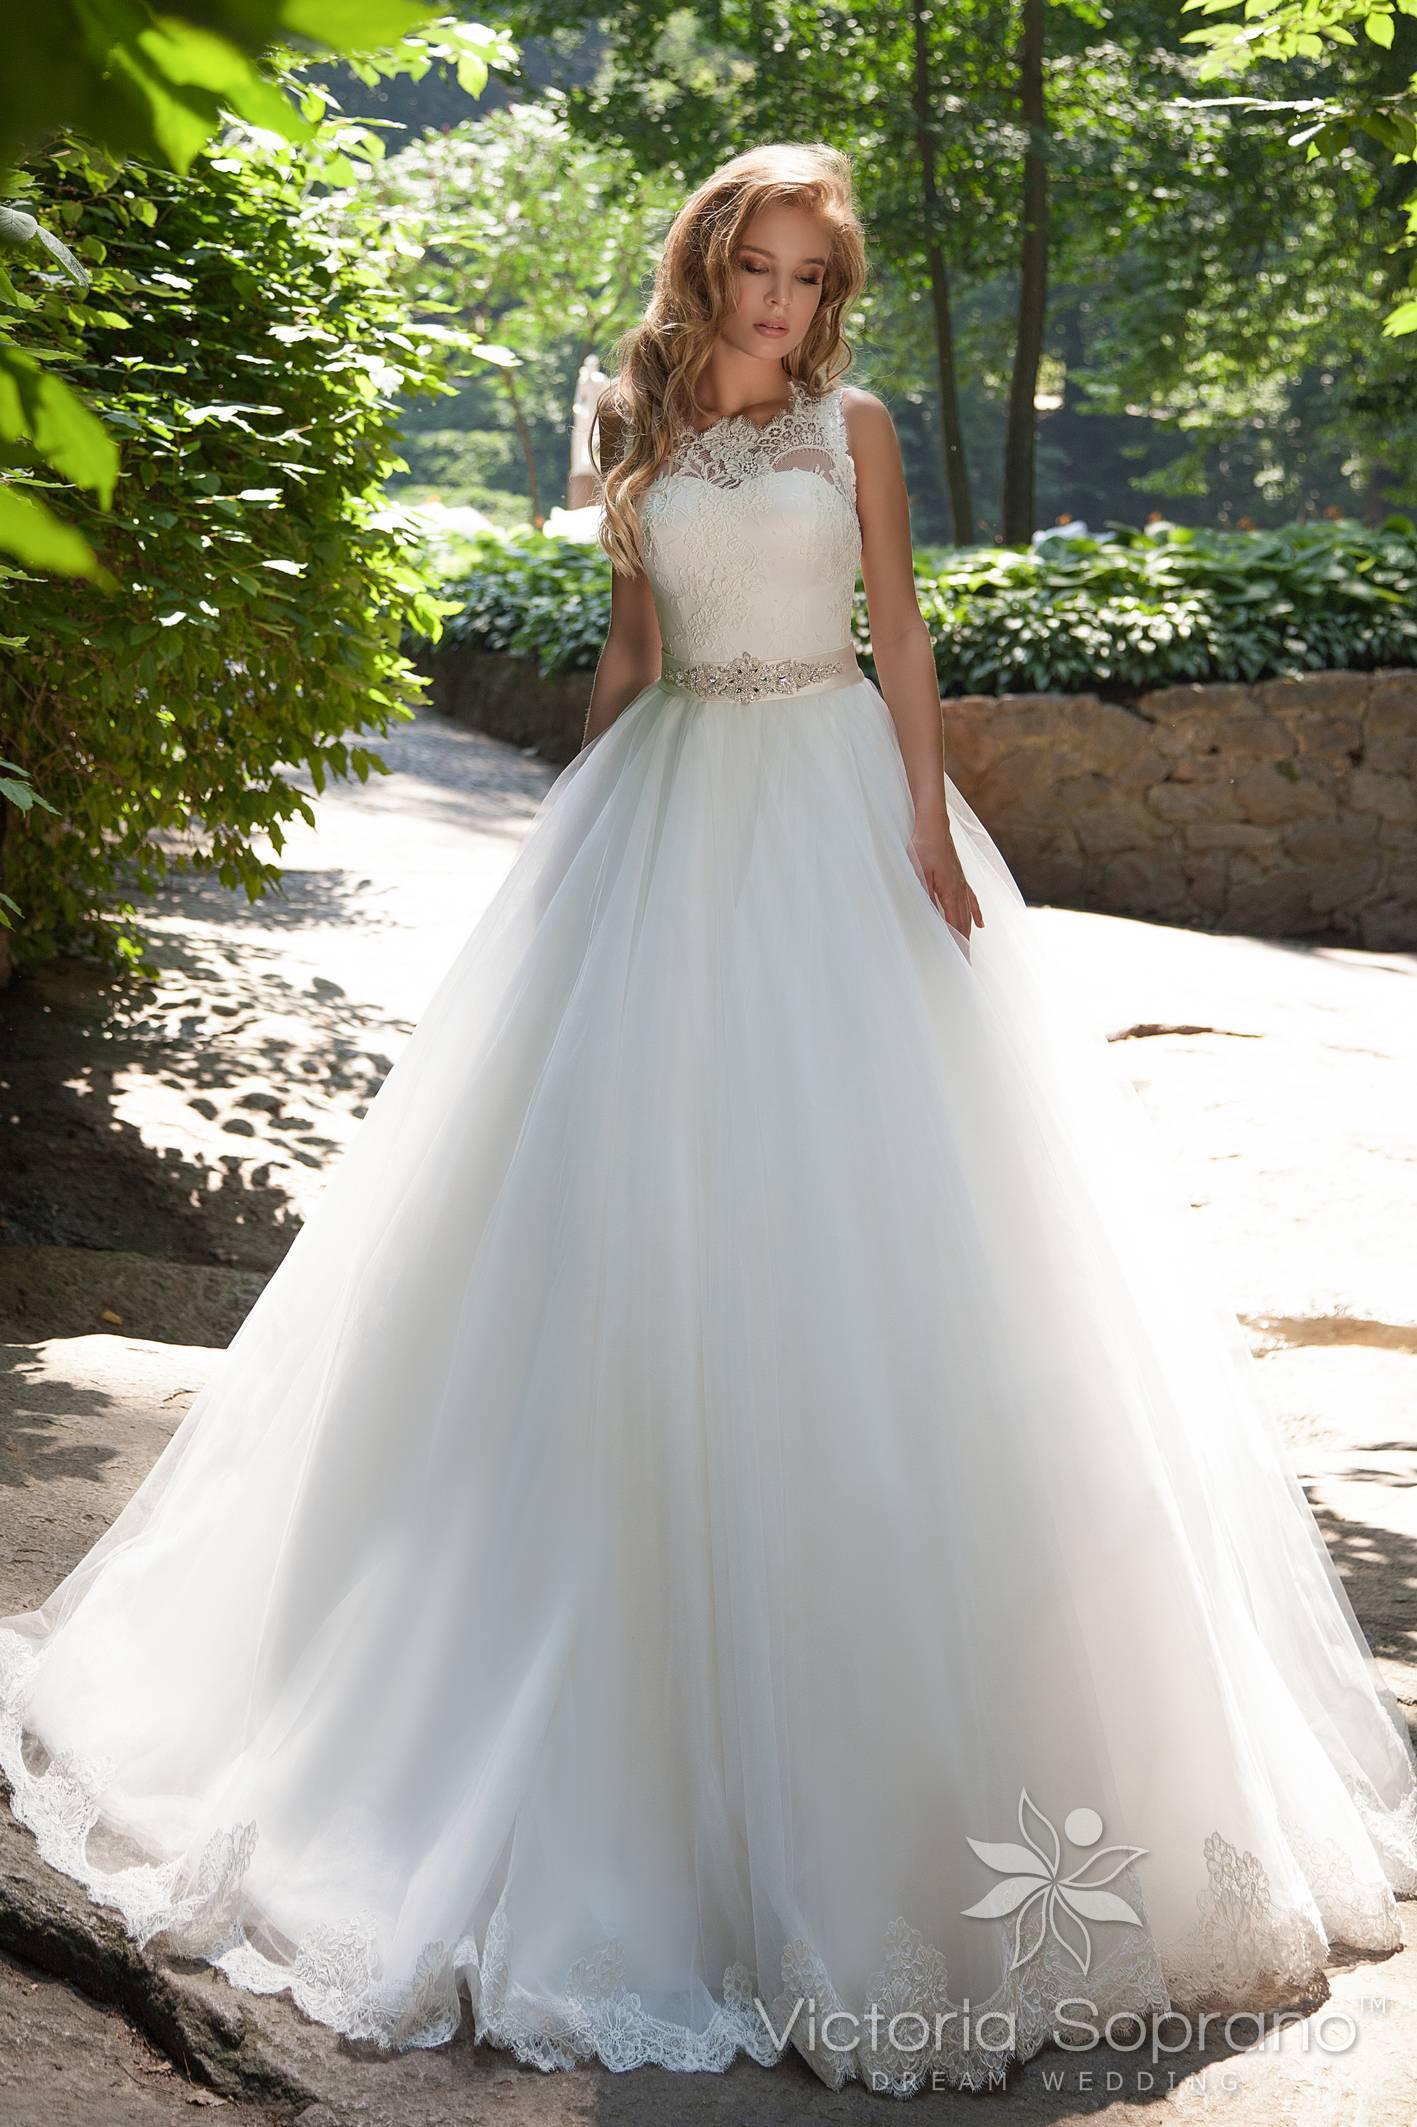 65235e413863baa Свадебное платье с кружевным верхом Victoria Soprano Barbie 2 ...